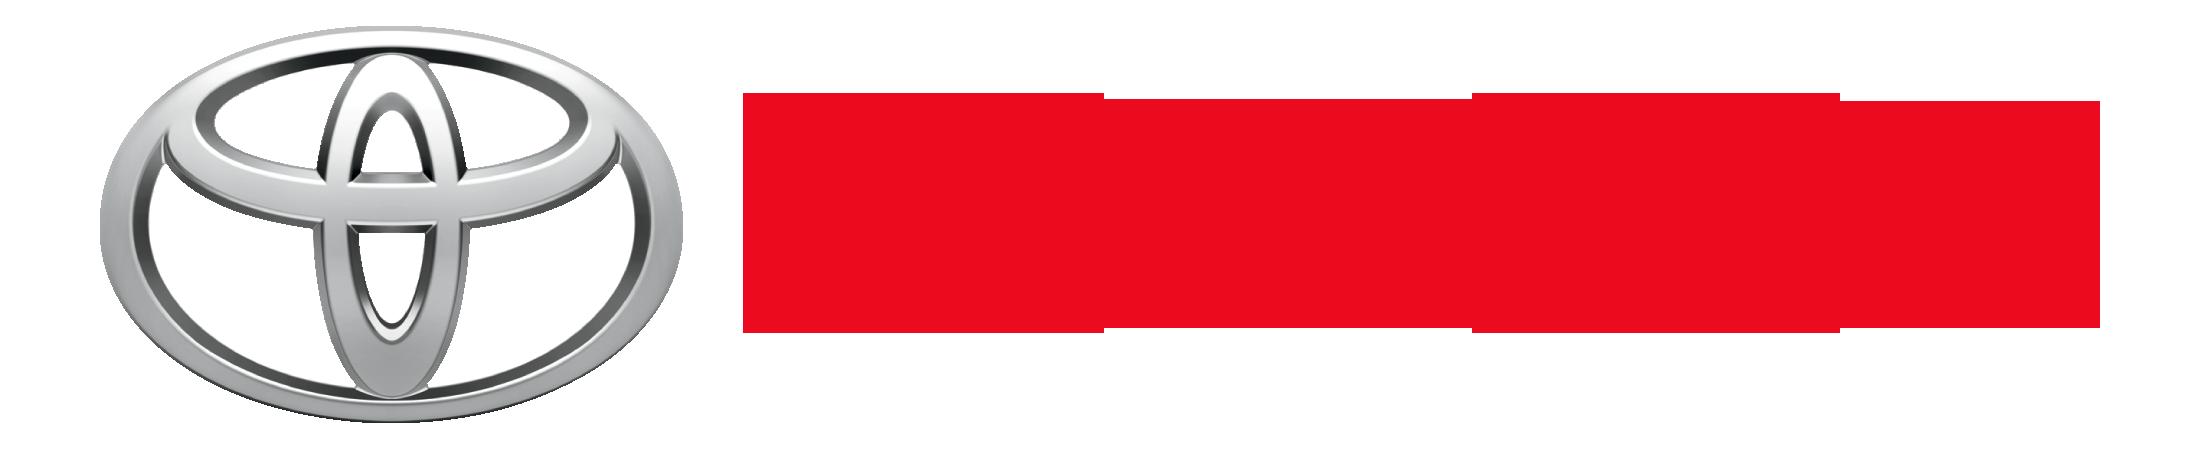 toyota-2